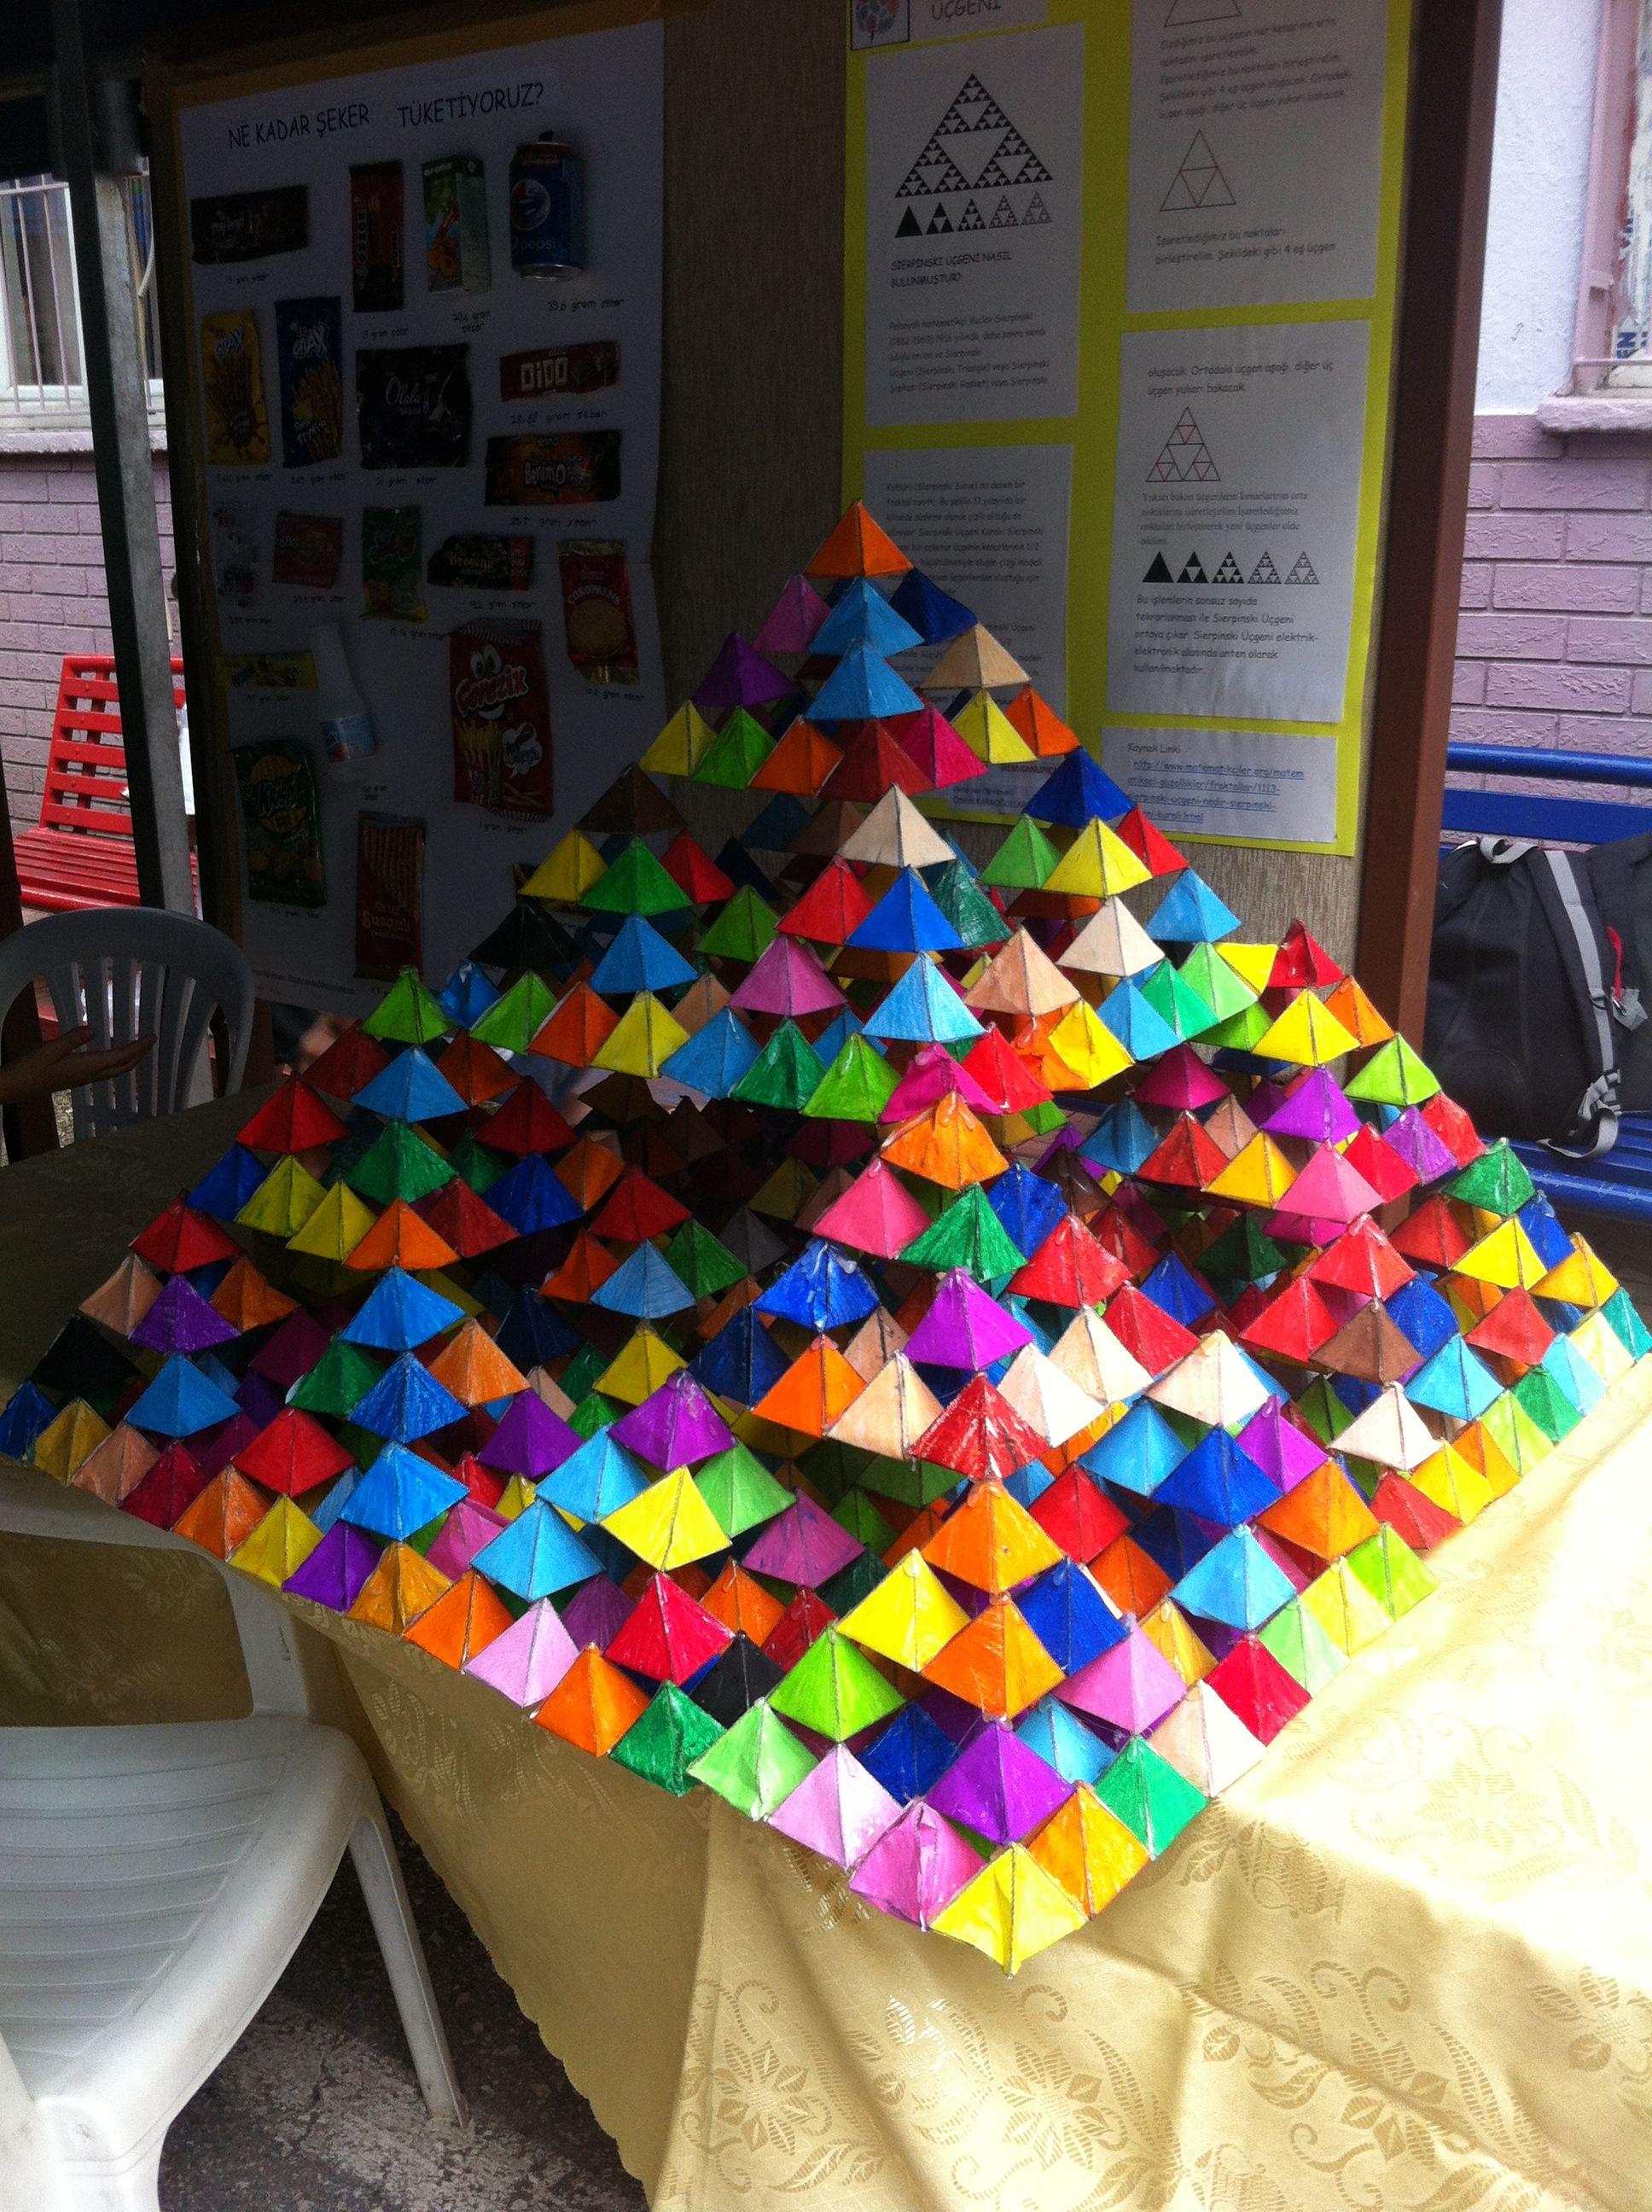 Sierpinski Pyramid